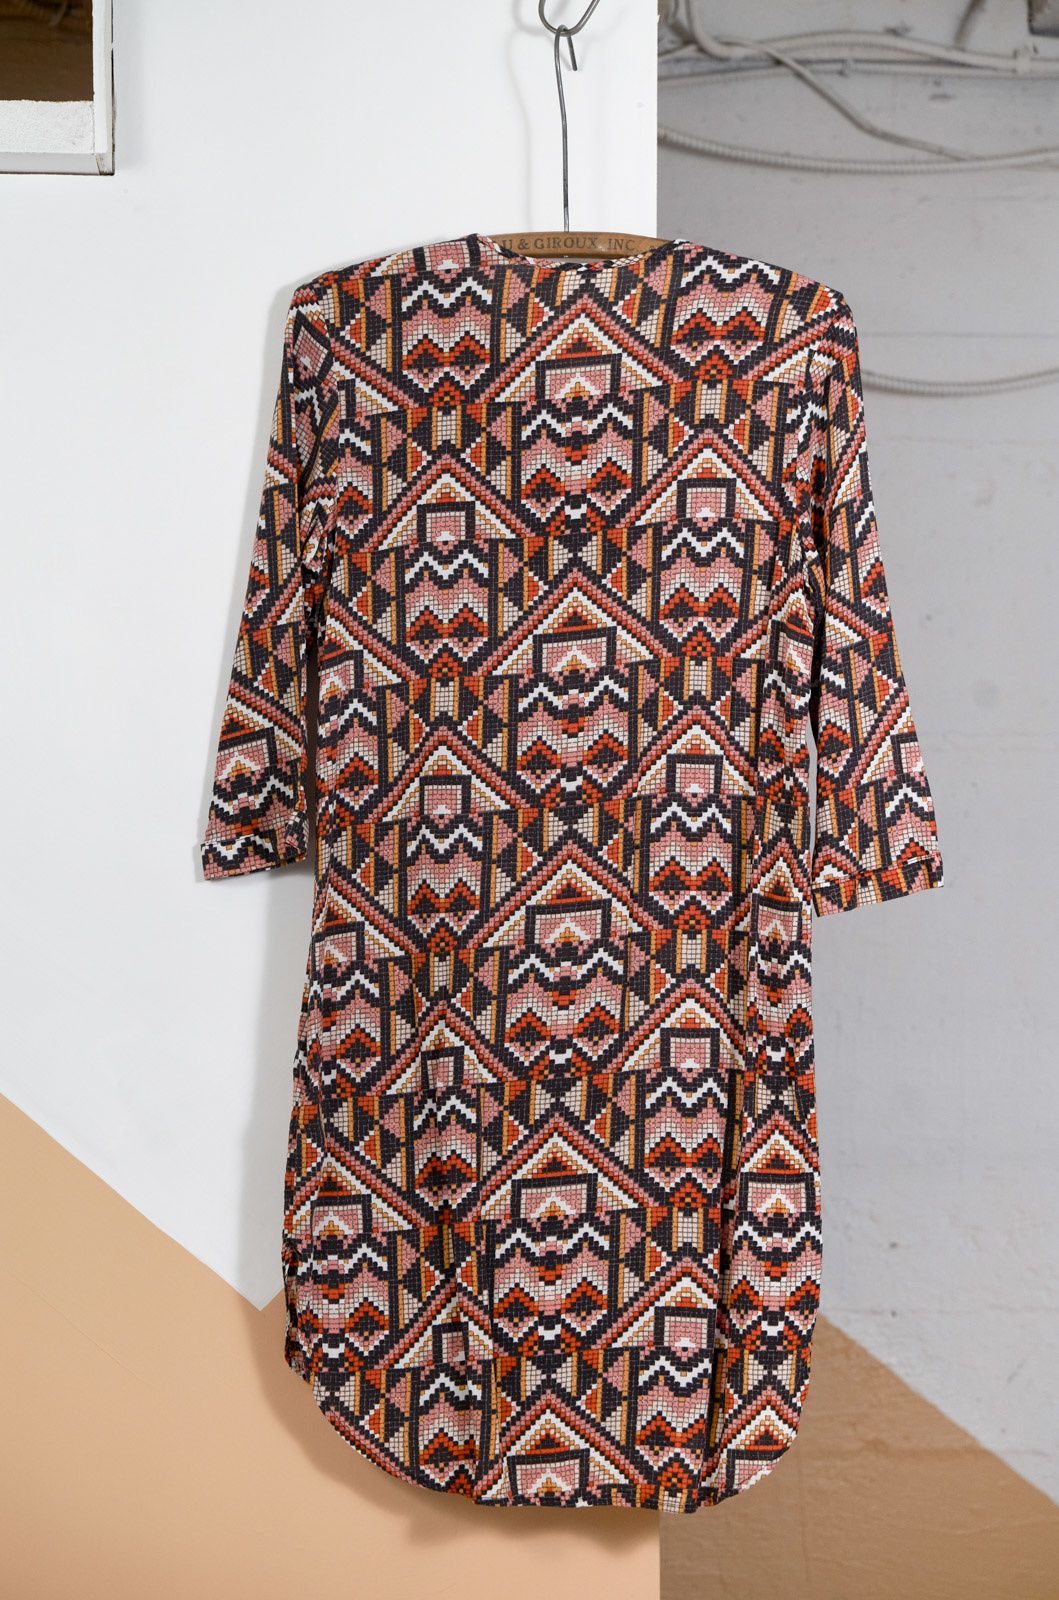 Tunic with Geometric Print Orange Coral Charcoal